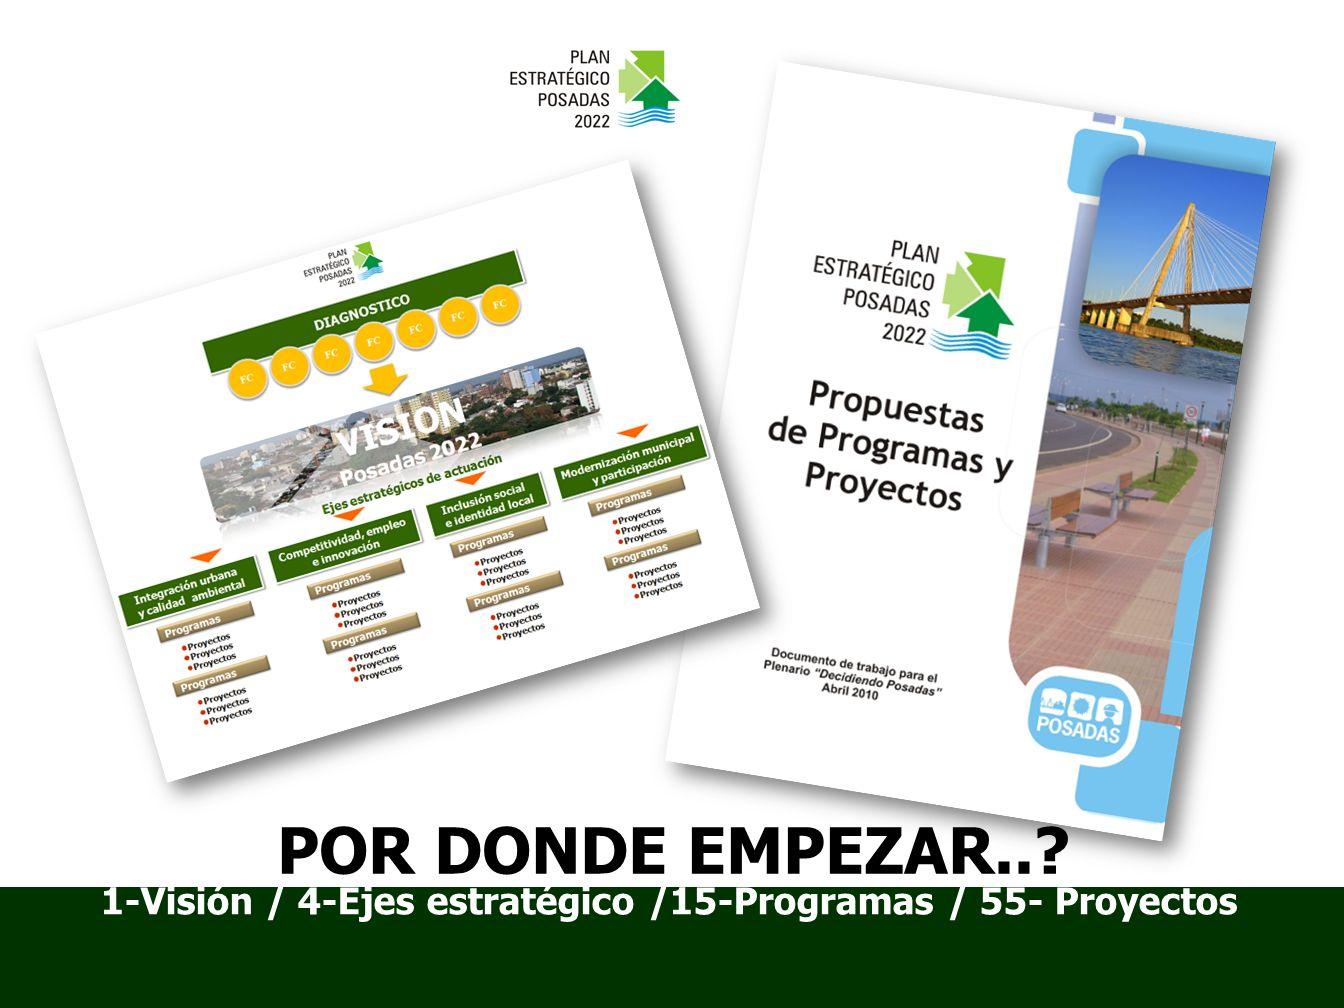 1-Visión / 4-Ejes estratégico /15-Programas / 55- Proyectos POR DONDE EMPEZAR..